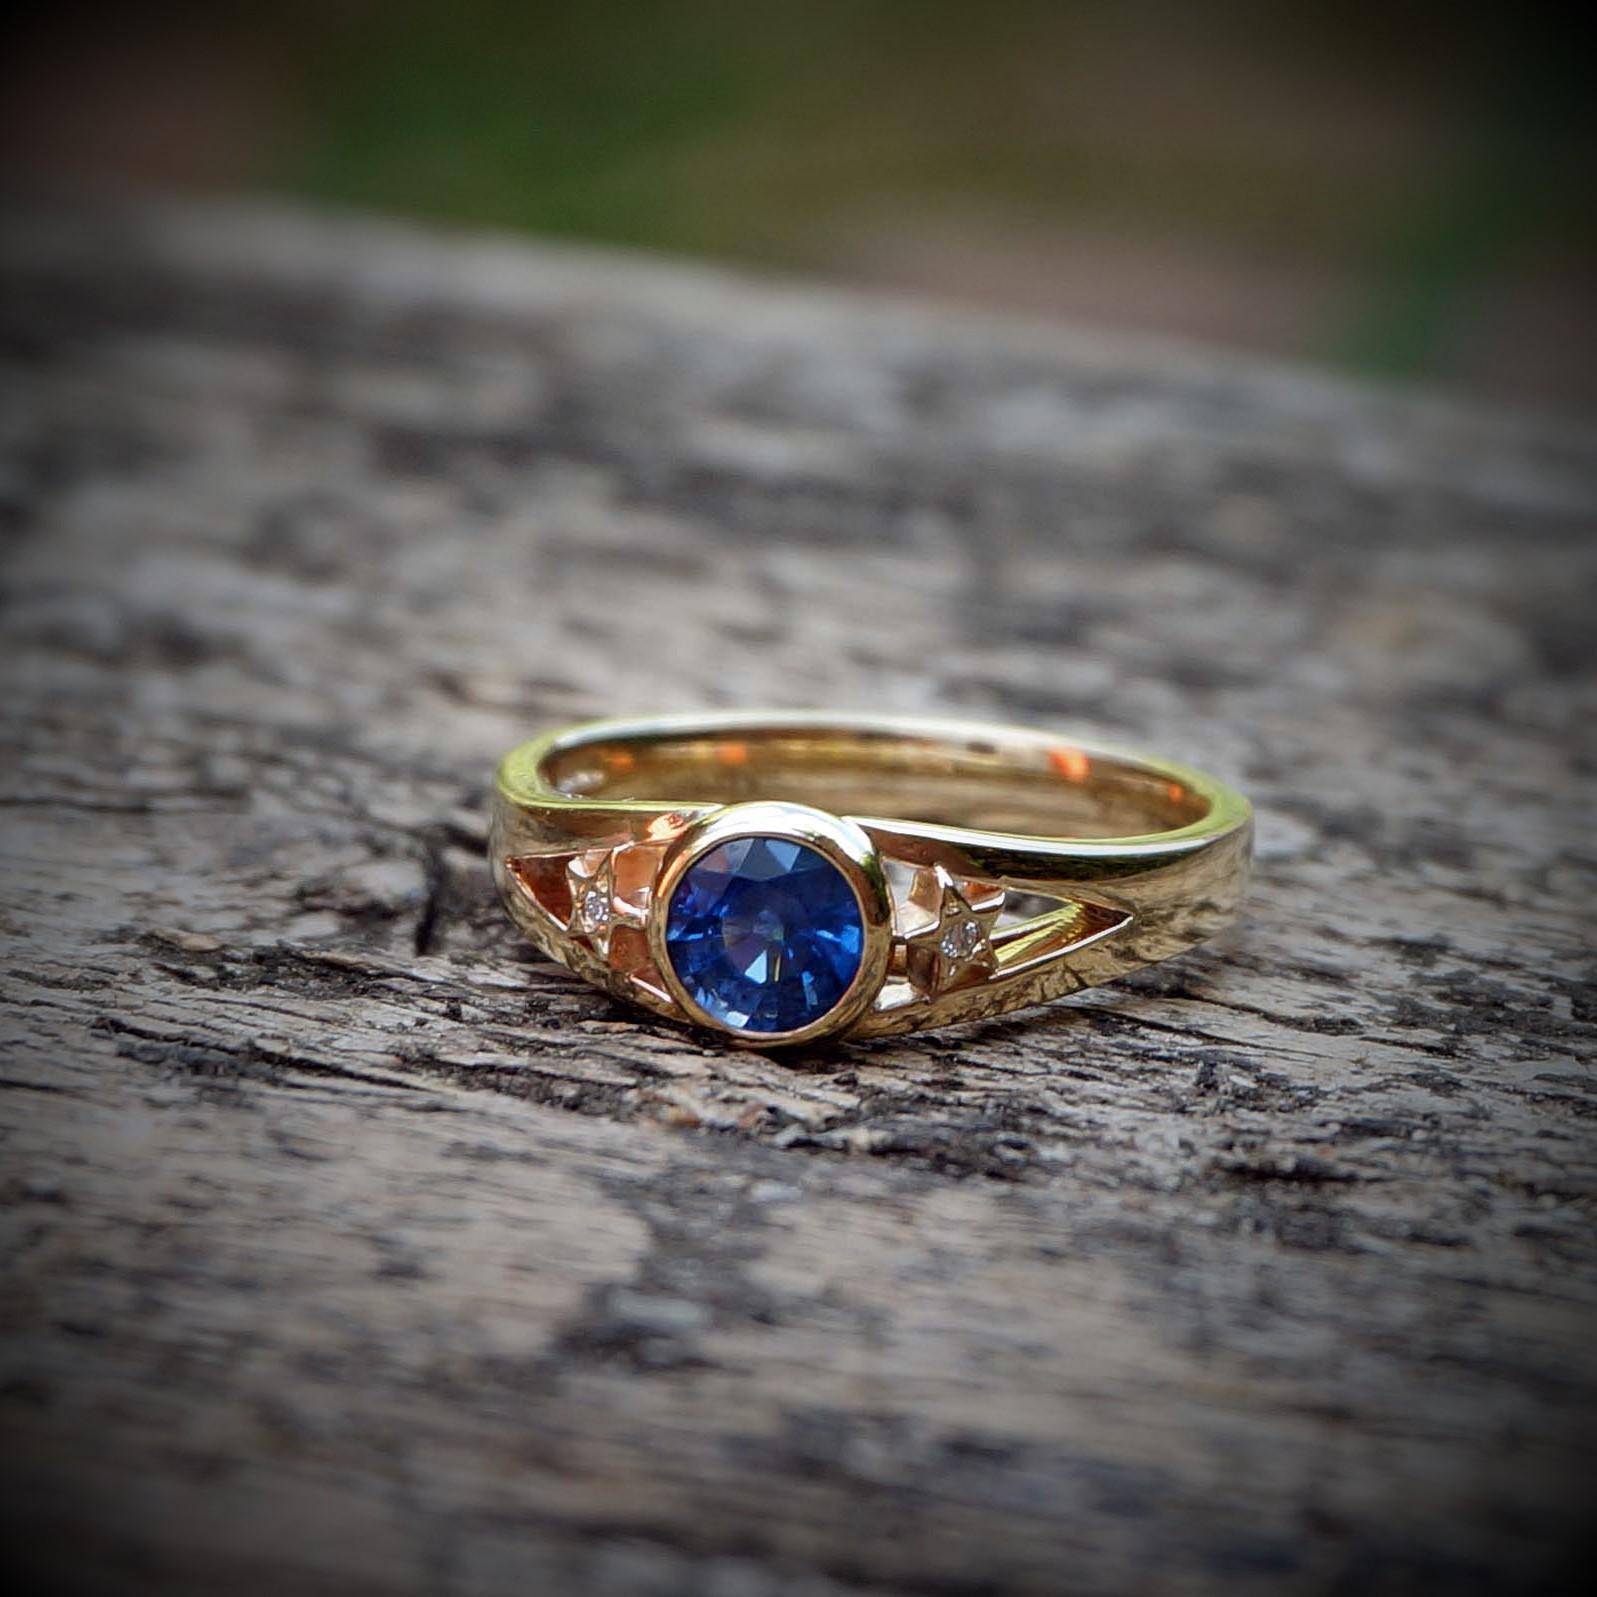 Park Road Jewellery, Bespoke Handmade Engagement Wedding Ring 18ct Yellow Gold Shaped Sapphire Diamond Gemstone Personalized Ring